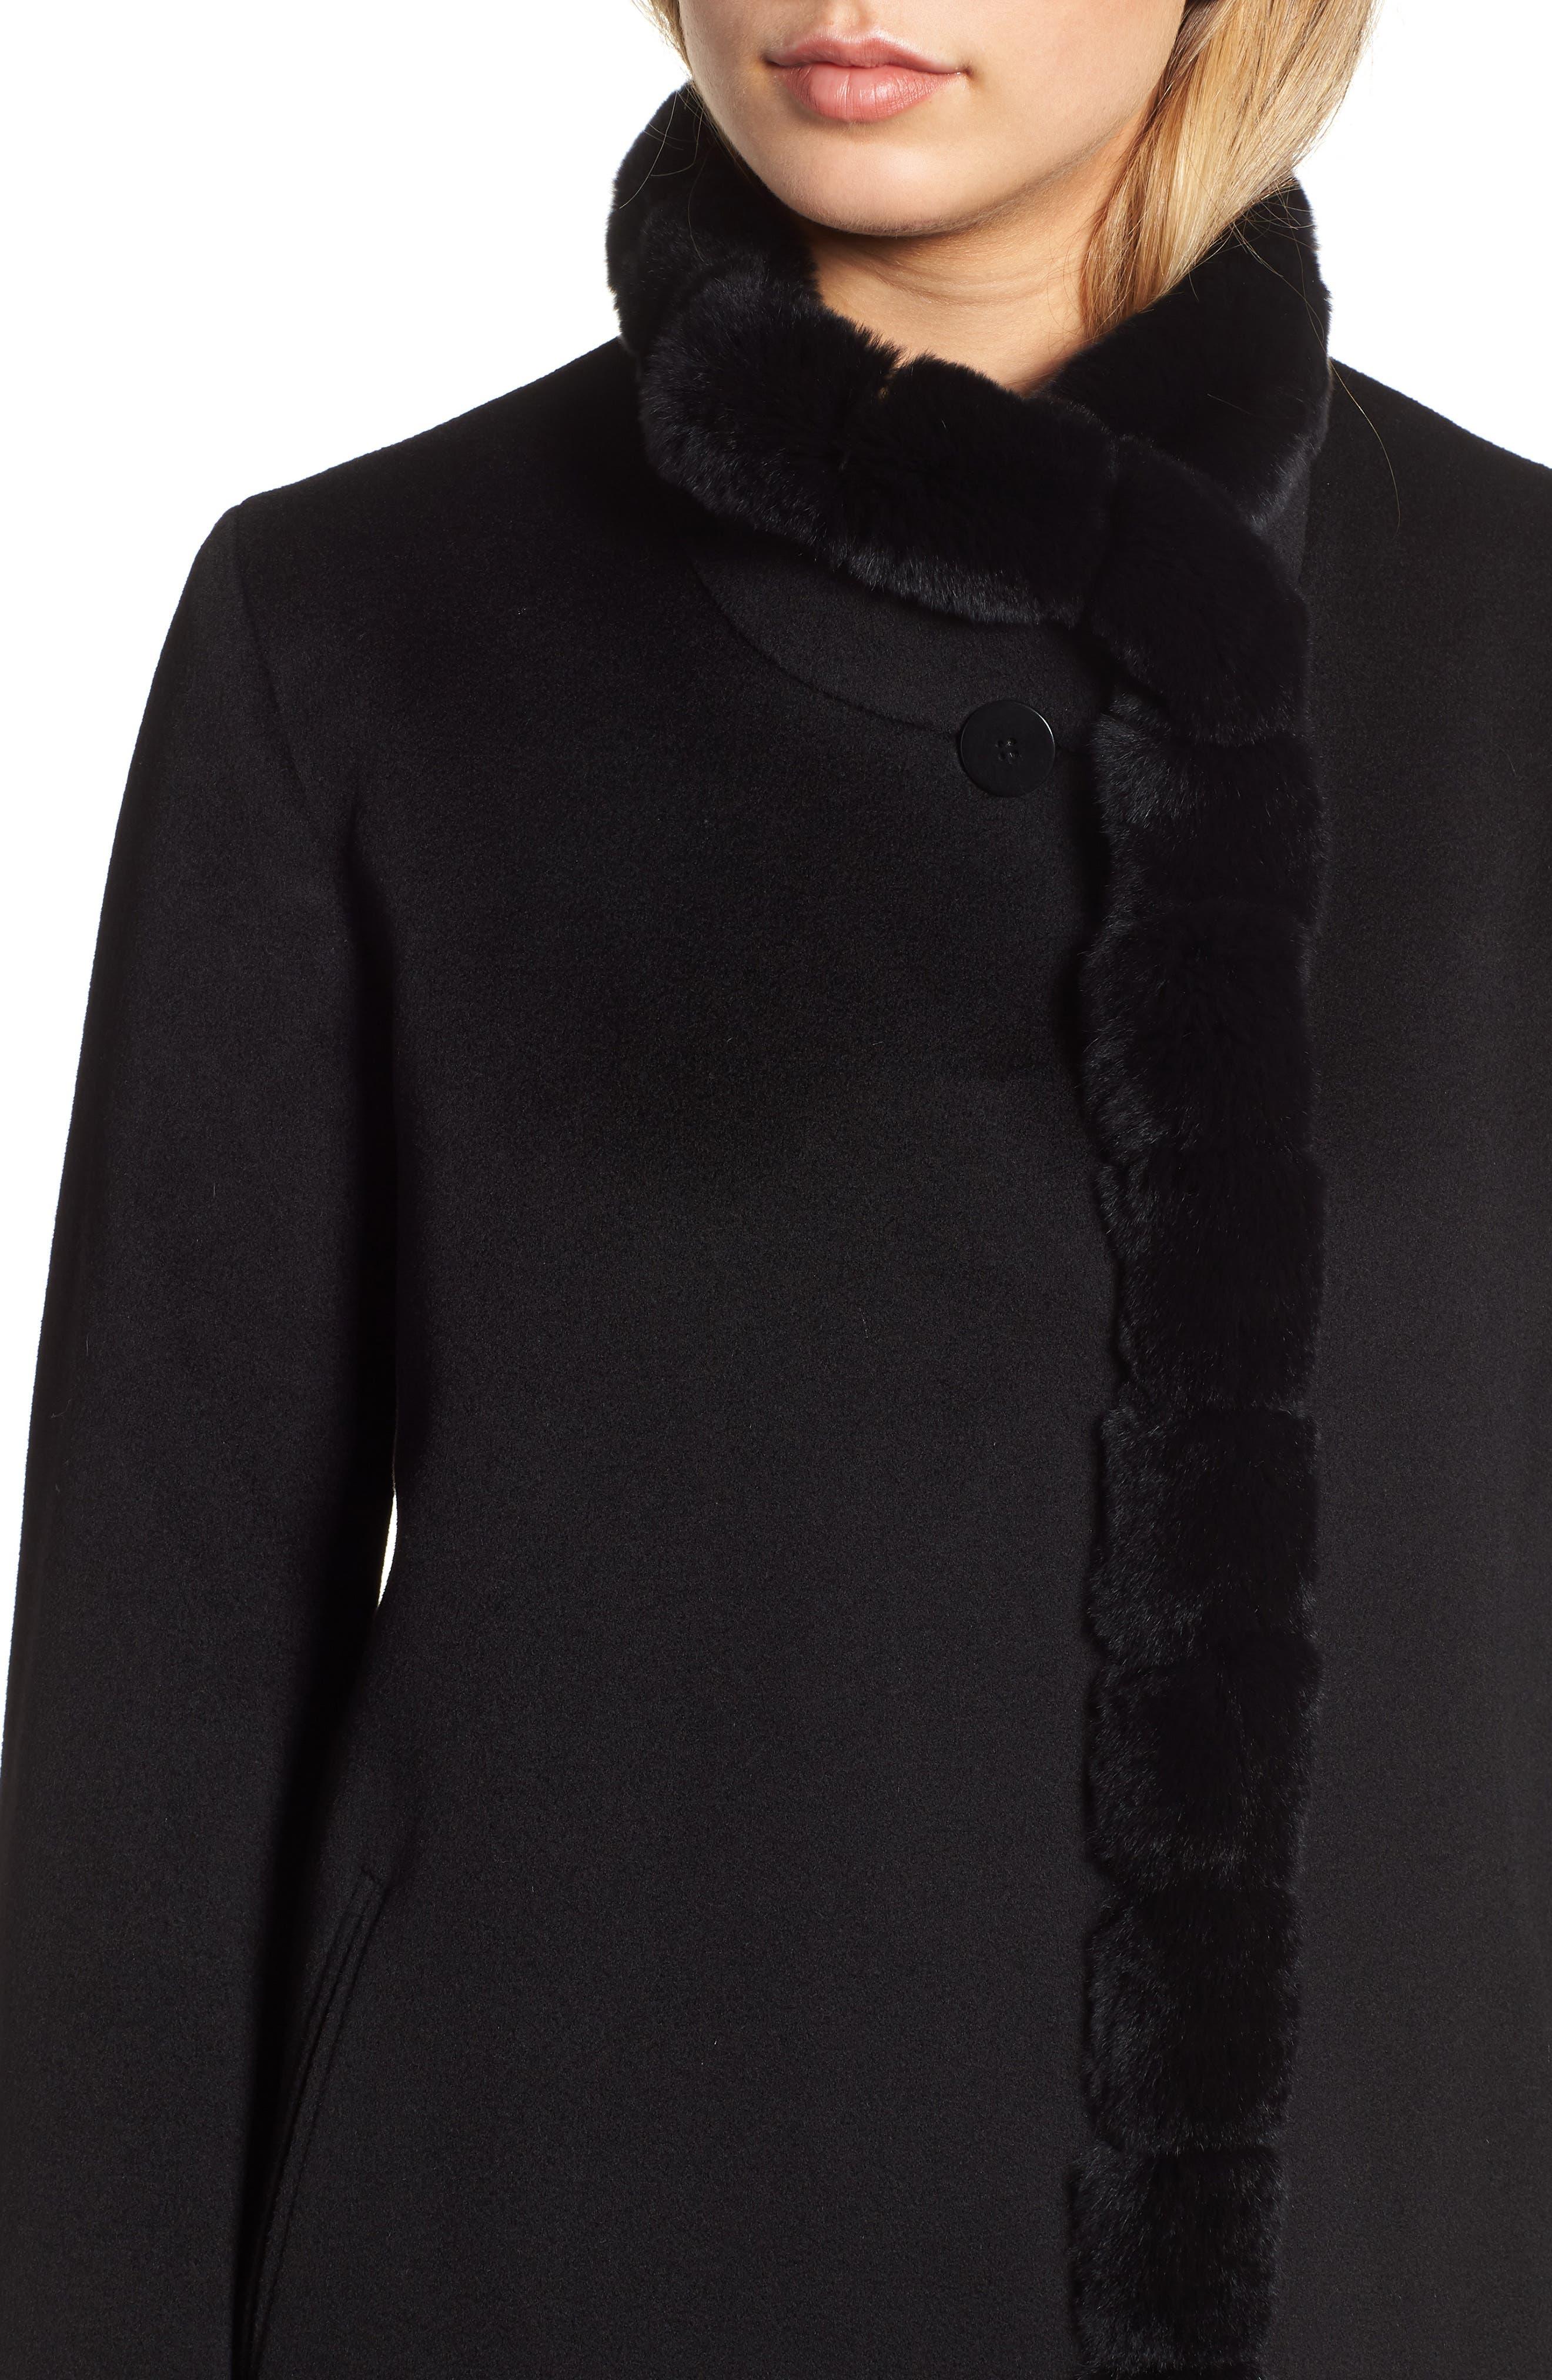 FLEURETTE,                             Loro Piana Wool Car Coat with Genuine Rex Rabbit Fur Trim,                             Alternate thumbnail 4, color,                             001